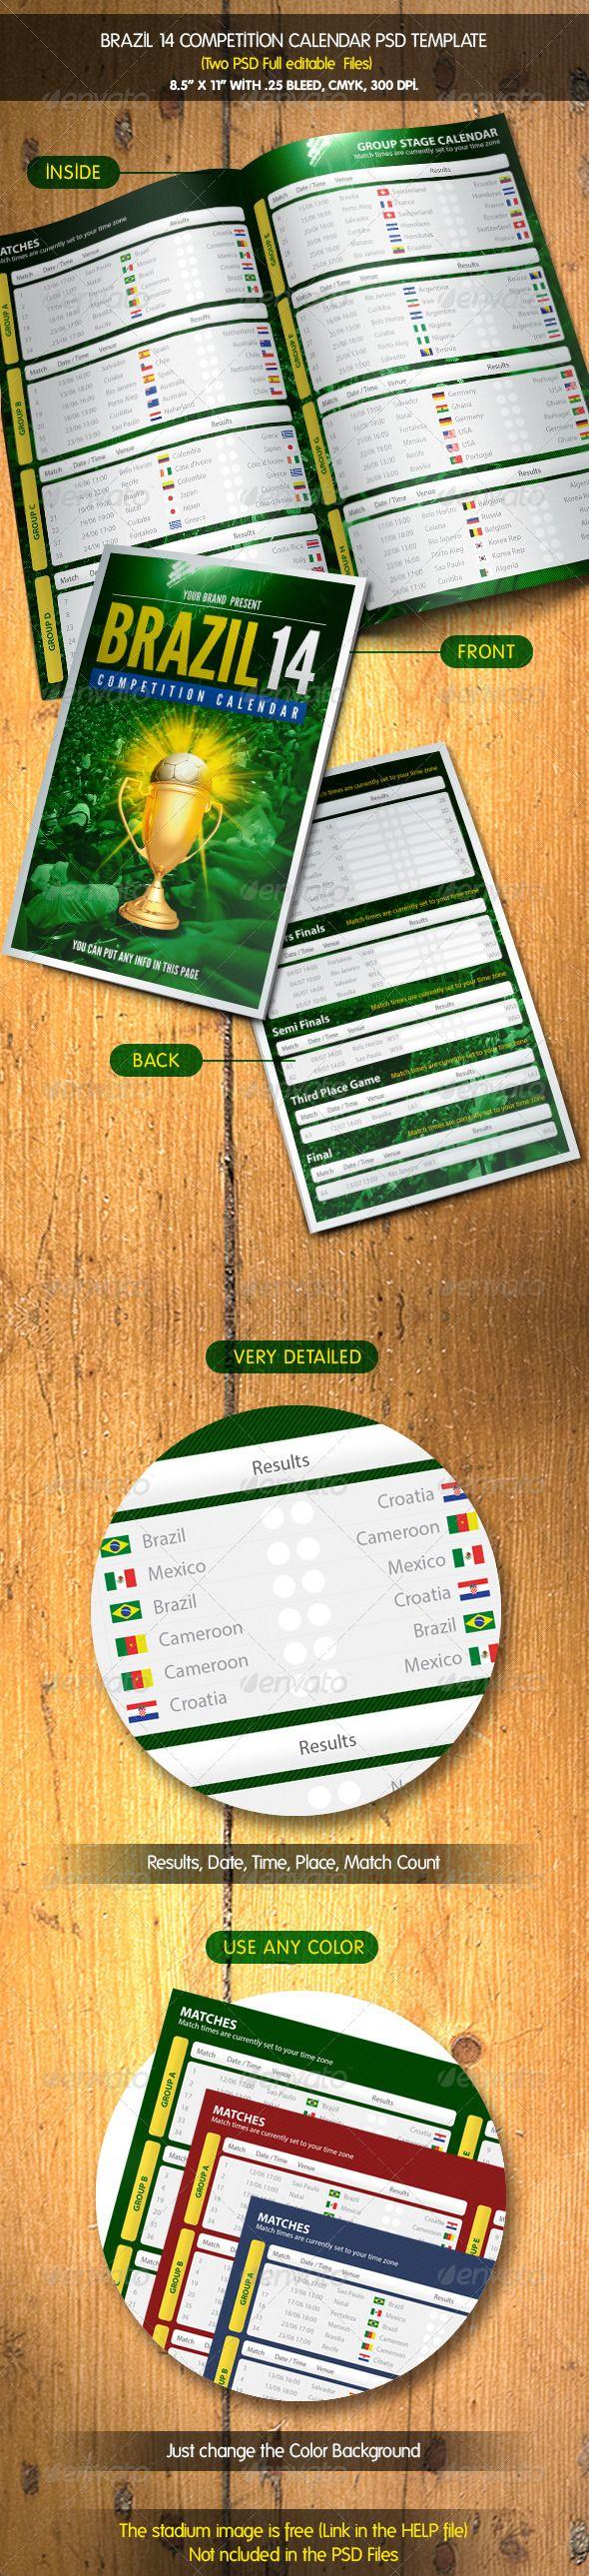 Brazil 14 Calendar | Match Schedule